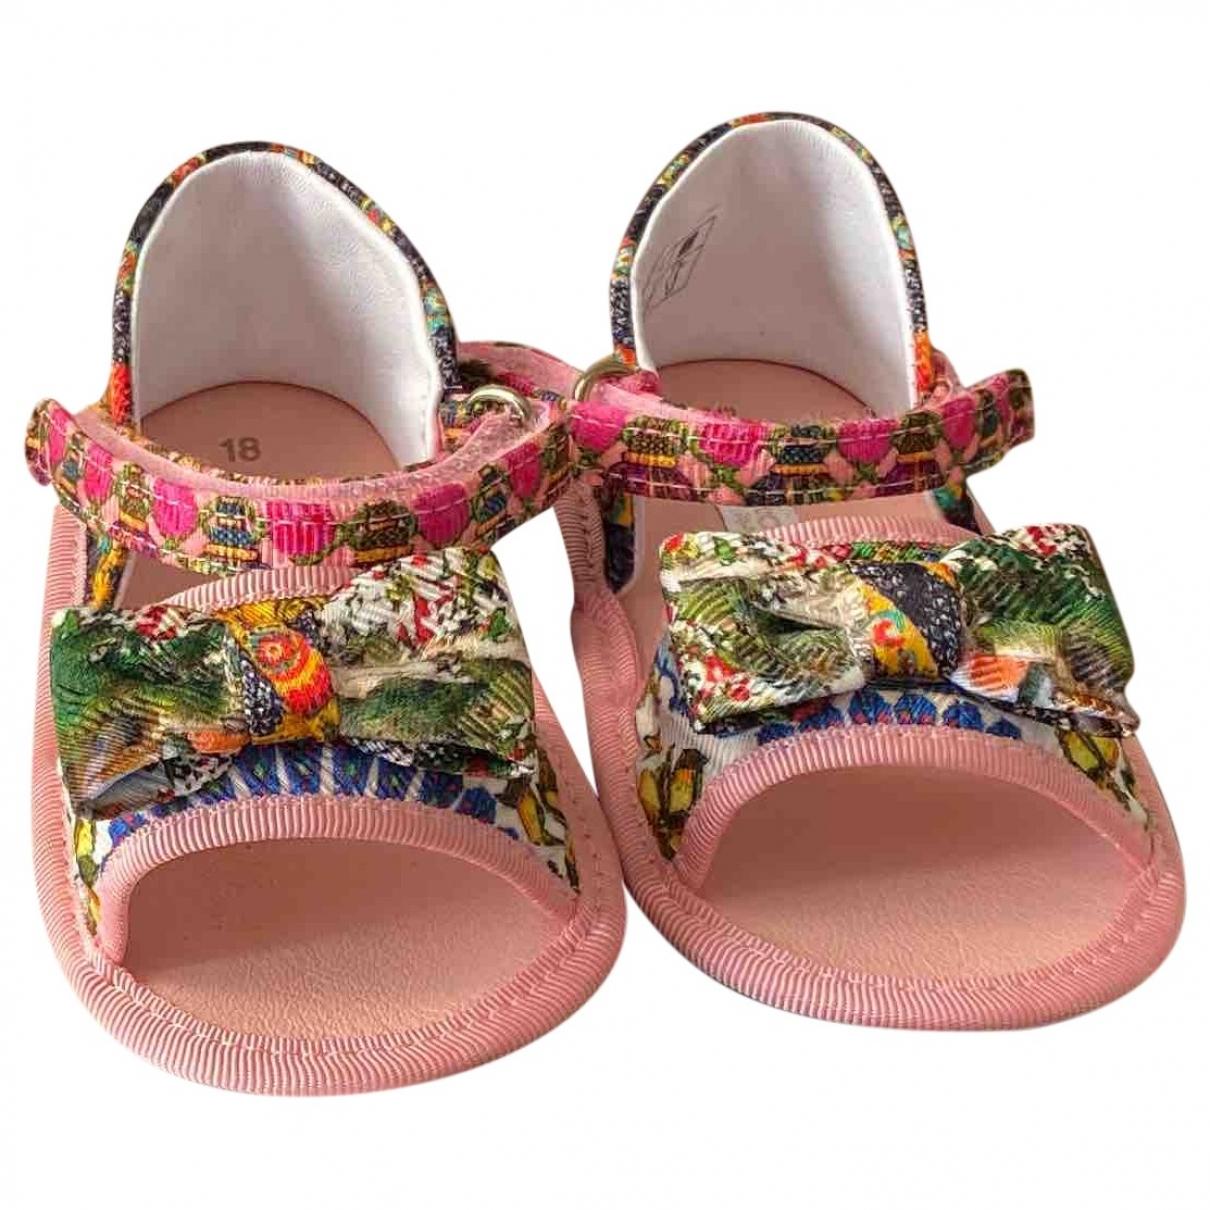 Dolce & Gabbana \N Sandalen in  Rosa Polyester